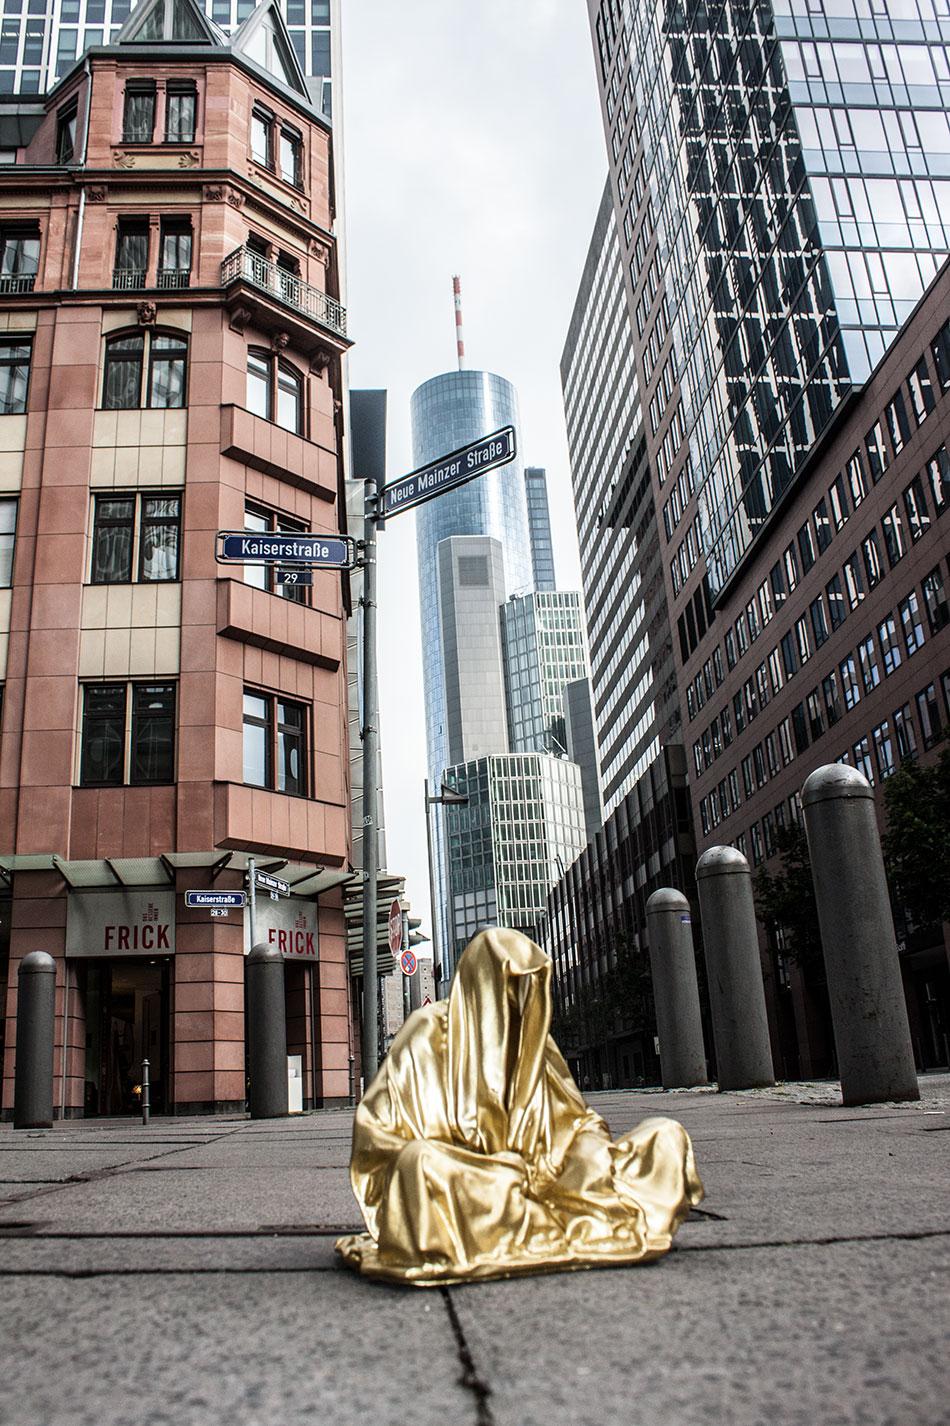 art-germany-frankfurt-guardians-of-time-manfred-kielnhofer-public-modern-contemporary-art-fine-arts-sculpture-design-streat-art-2238